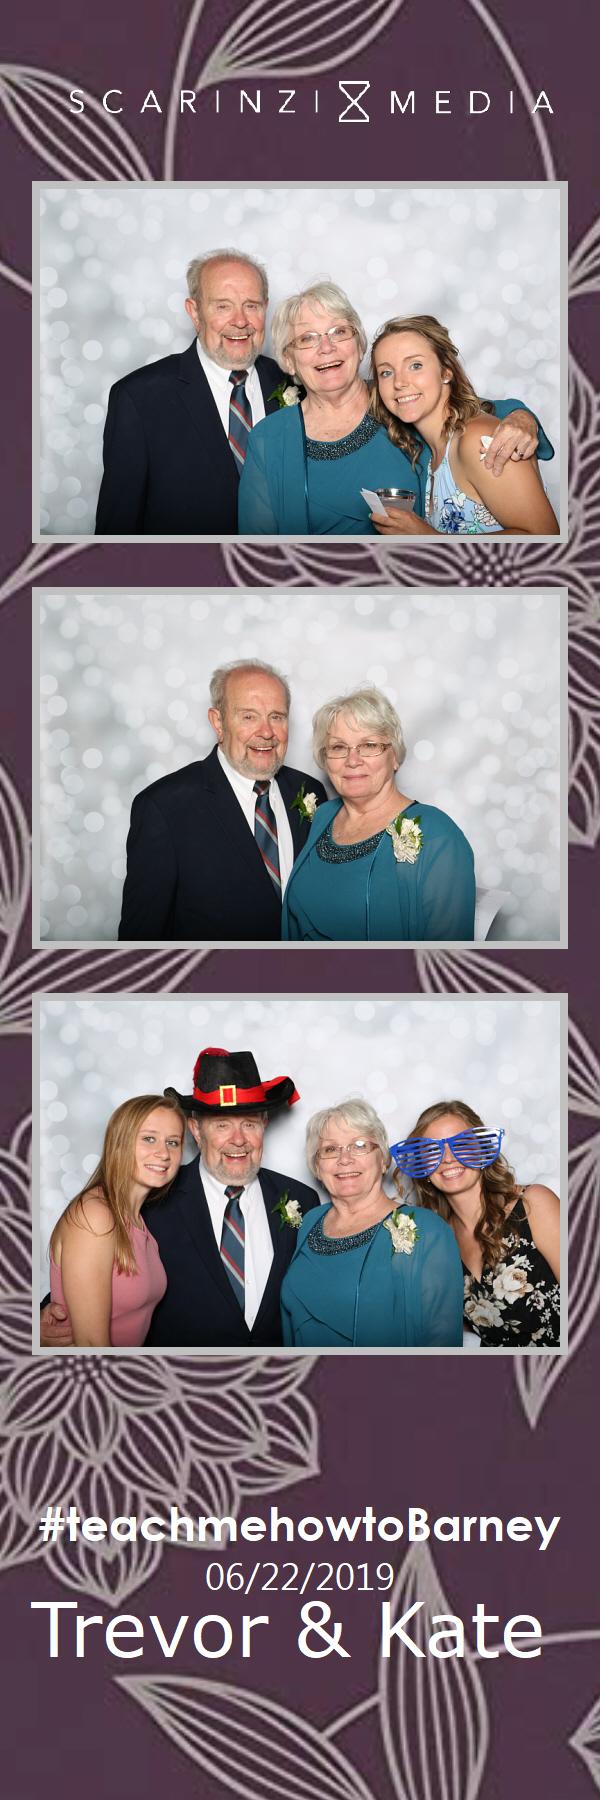 2019.06.22 - Barney Wedding PHOTOBOOTH13.jpg